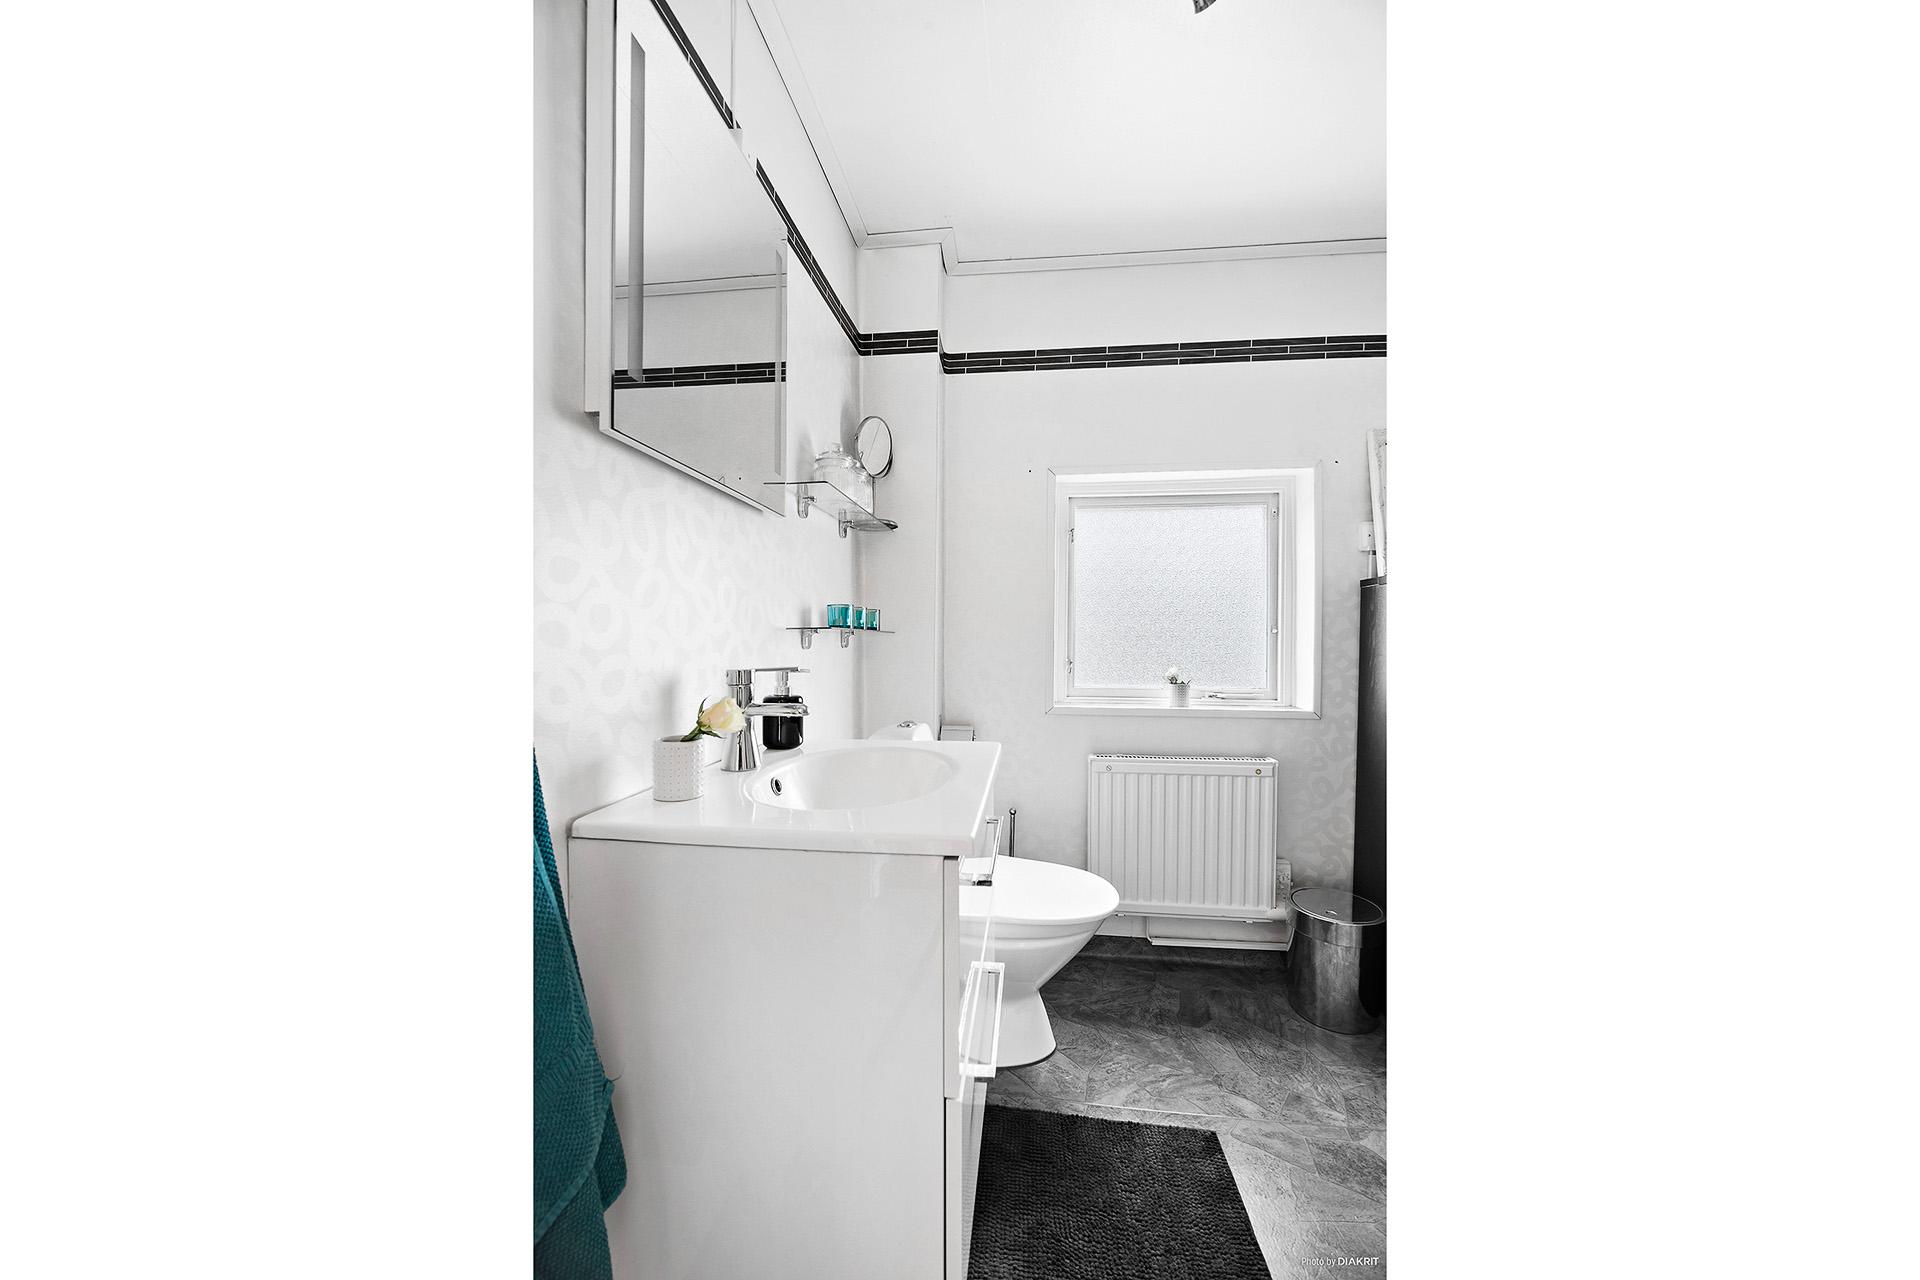 ..badrum! Båda från 2012